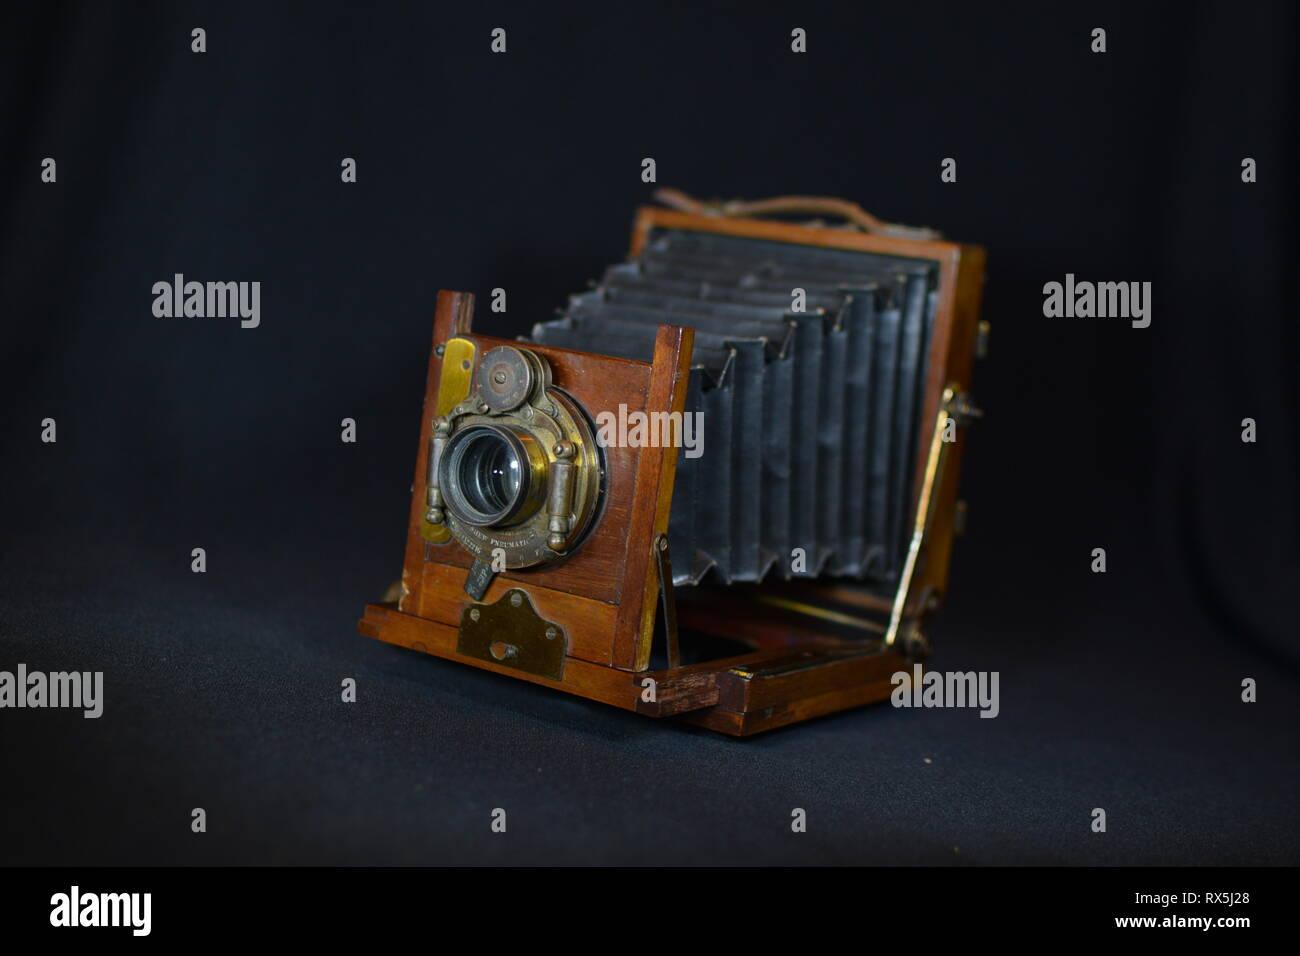 Vintage folding camera - Stock Image